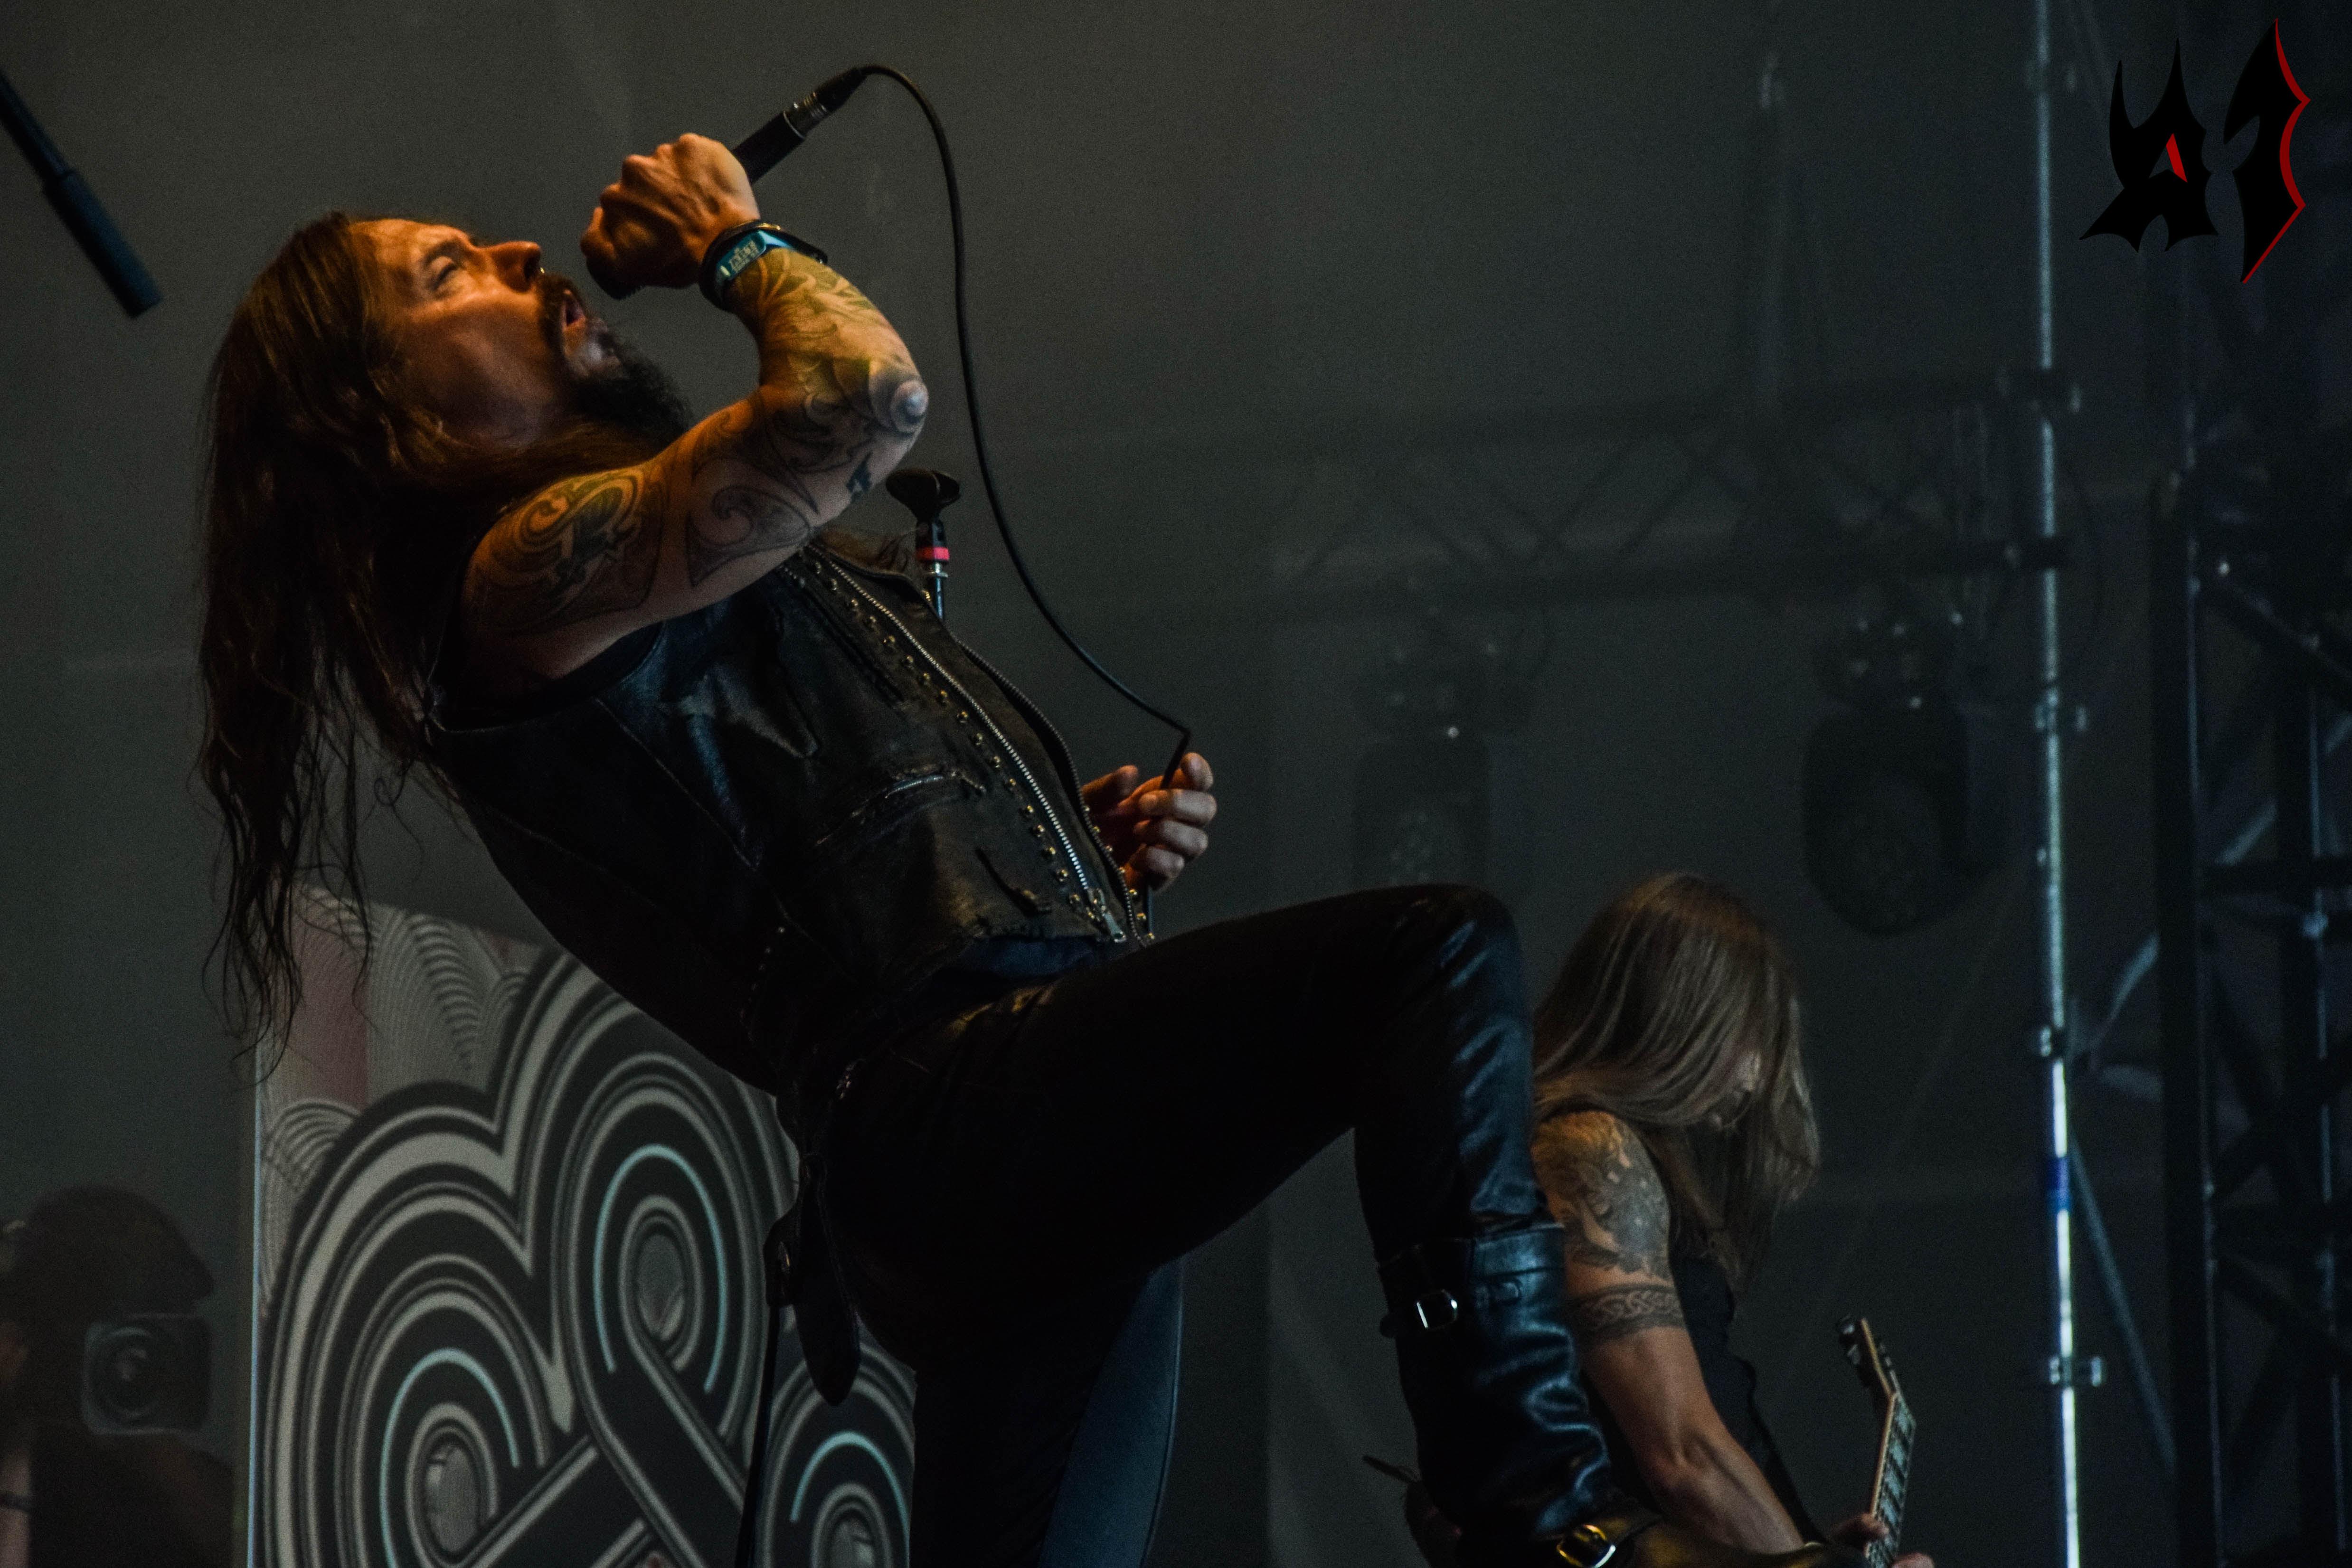 Hellfest 2018 – Day 3 - Amorphis 3